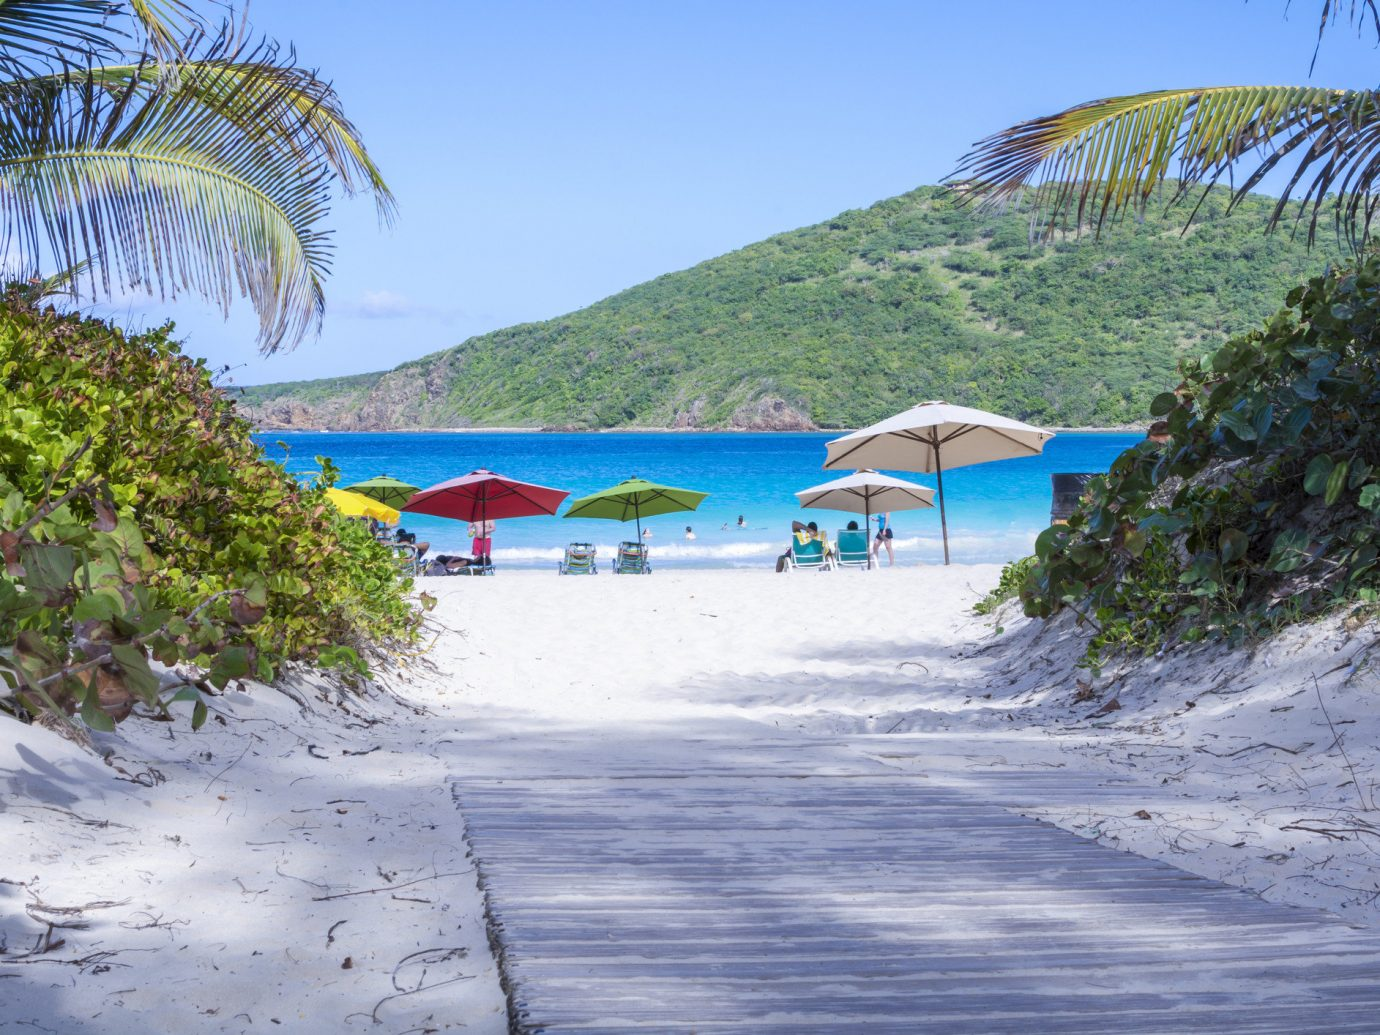 Secret Getaways Trip Ideas outdoor tree water Beach shore Nature body of water Sea Ocean vacation Coast caribbean bay Lagoon tropics Island Resort cove lined day